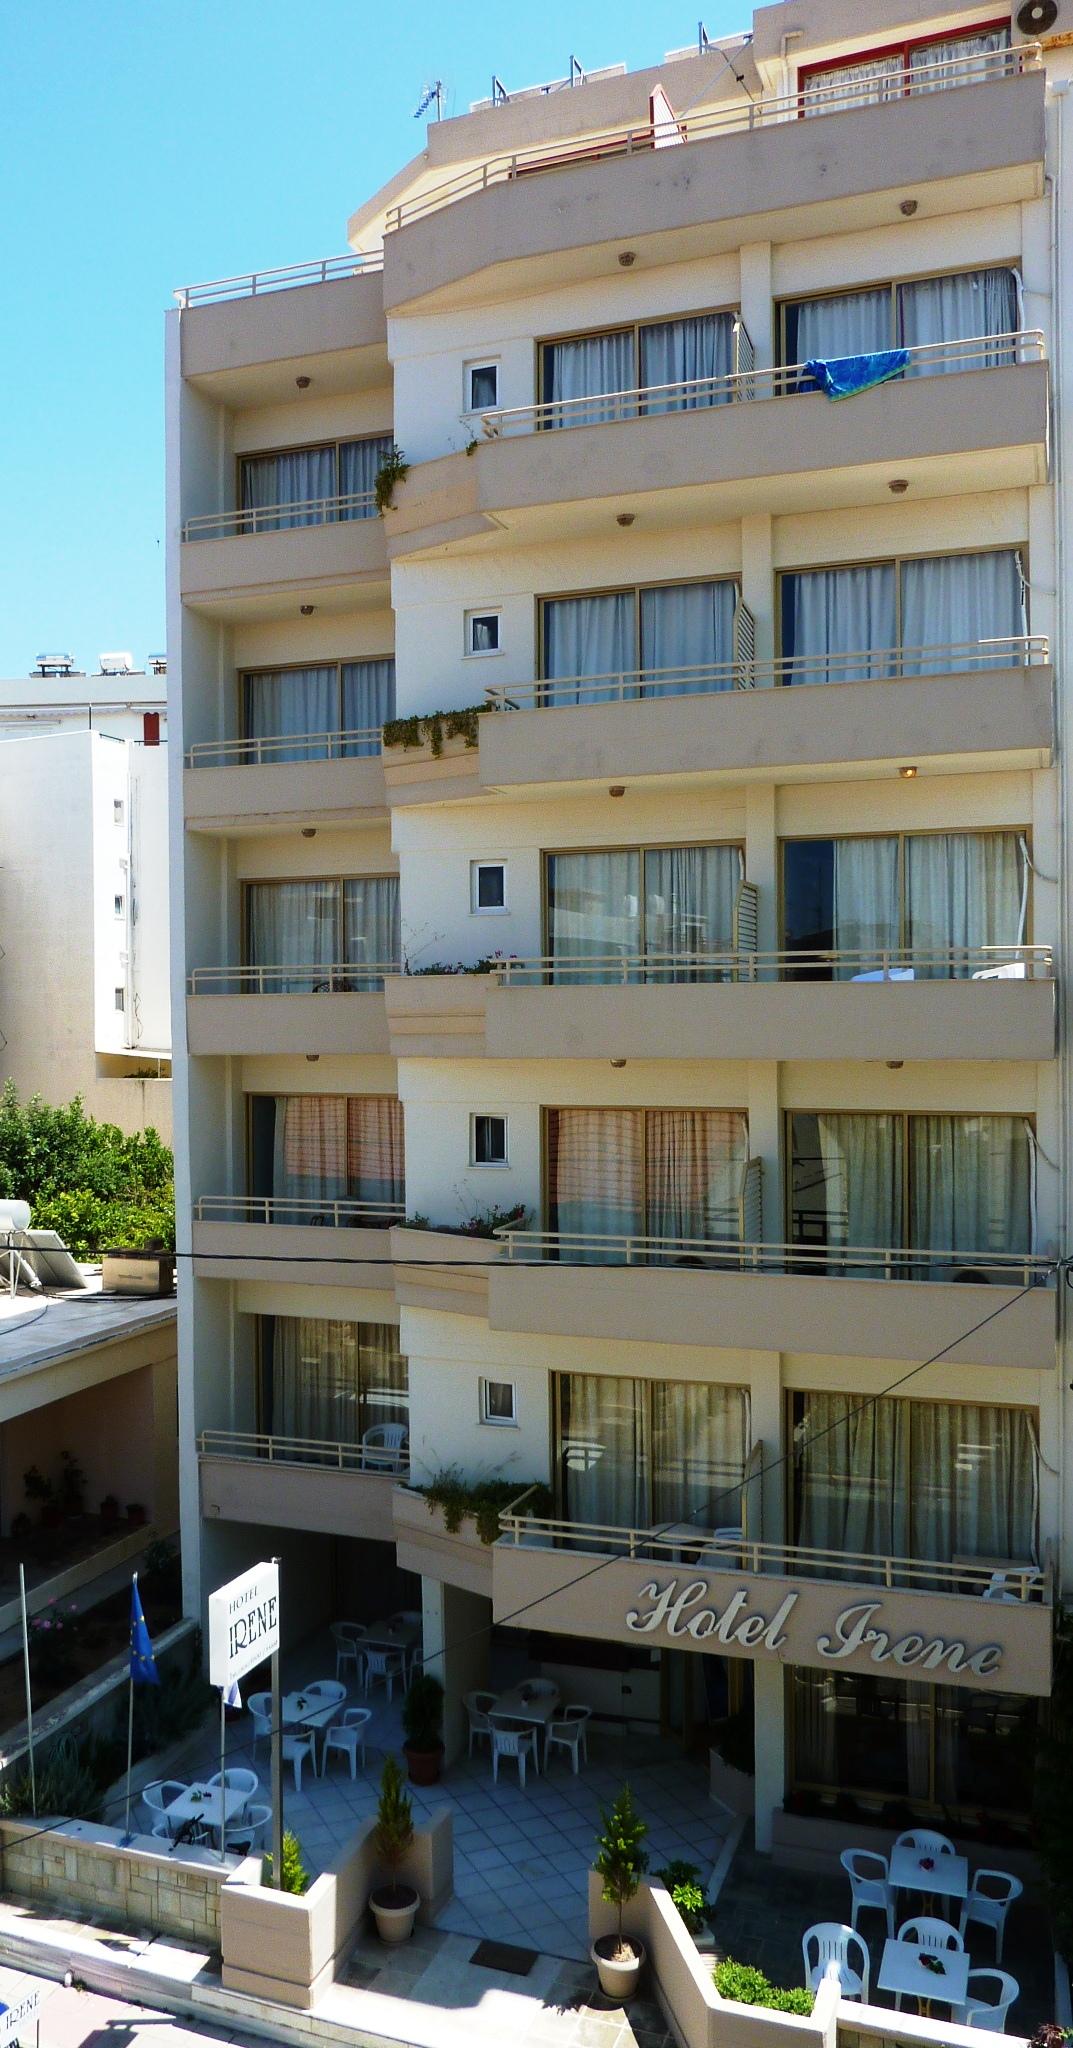 Irene, Crete